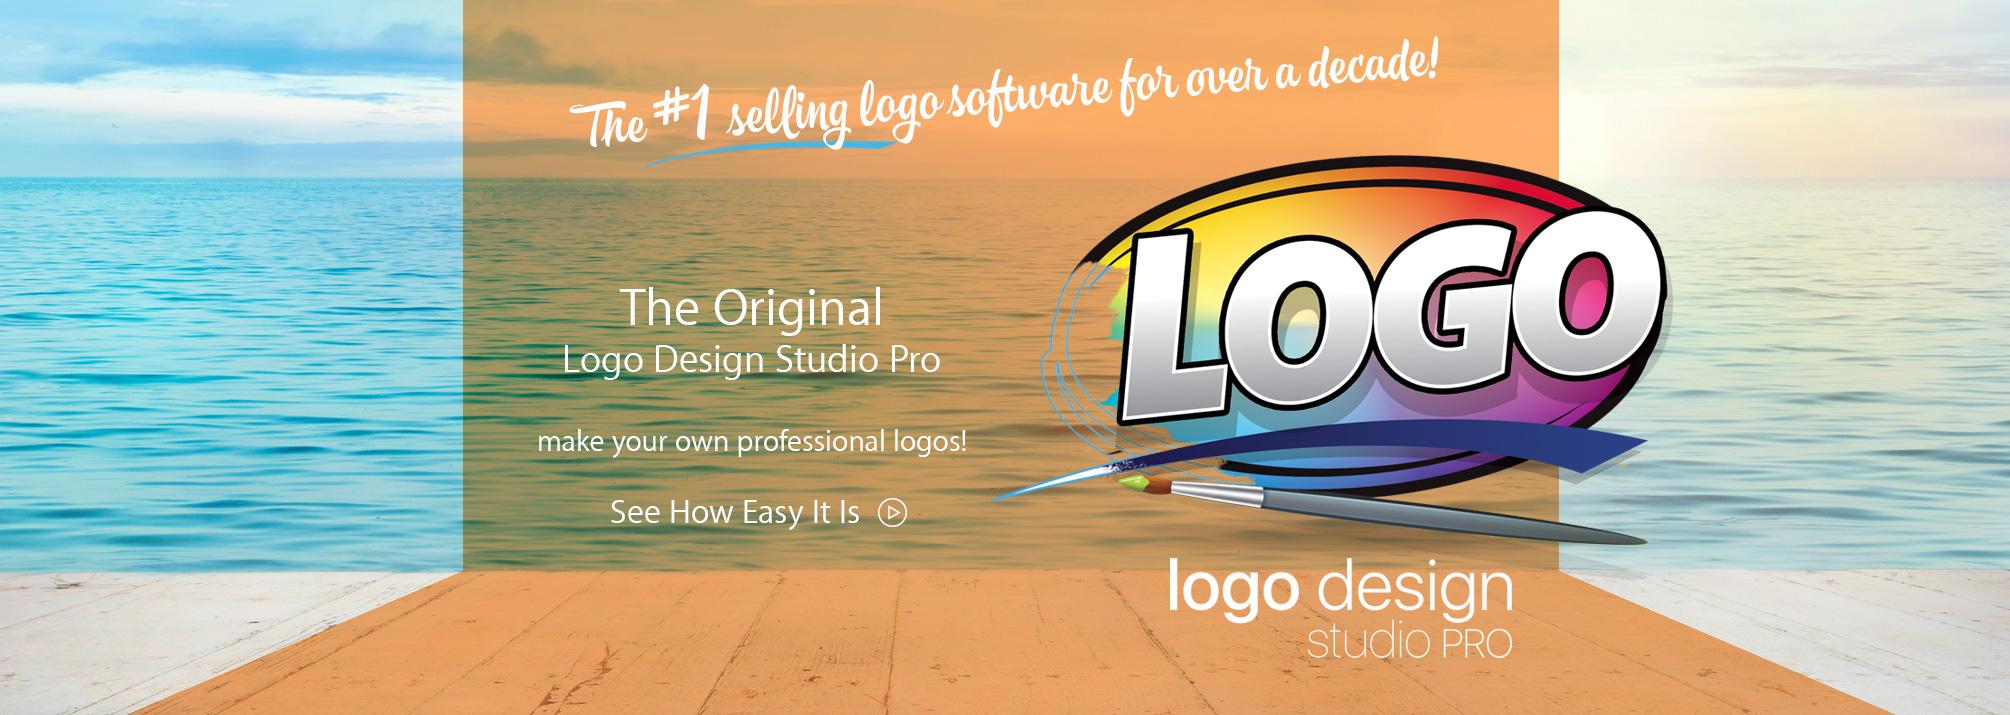 Summitsoft logo design studio torrent